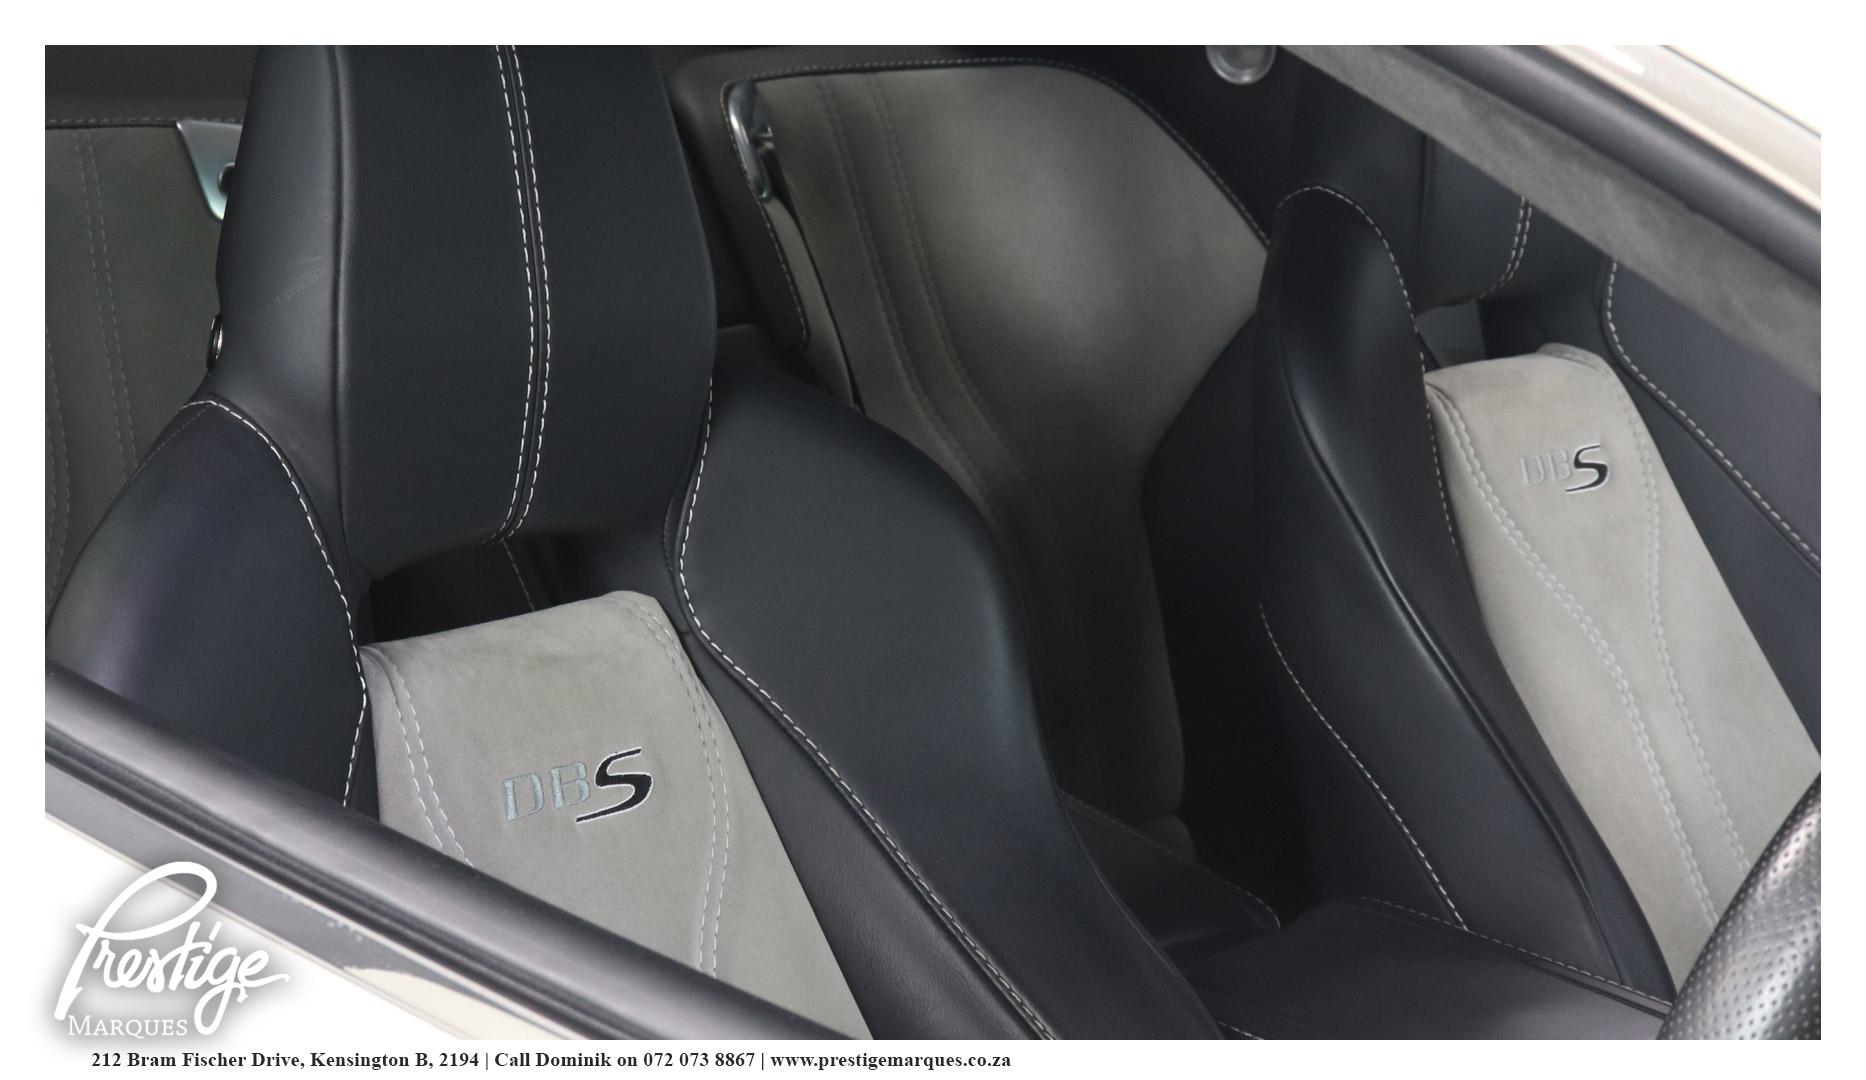 Aston-Martin-DBS-Coupe-Auto-2009-Prestige-Marques-Randburg-Sandton-10